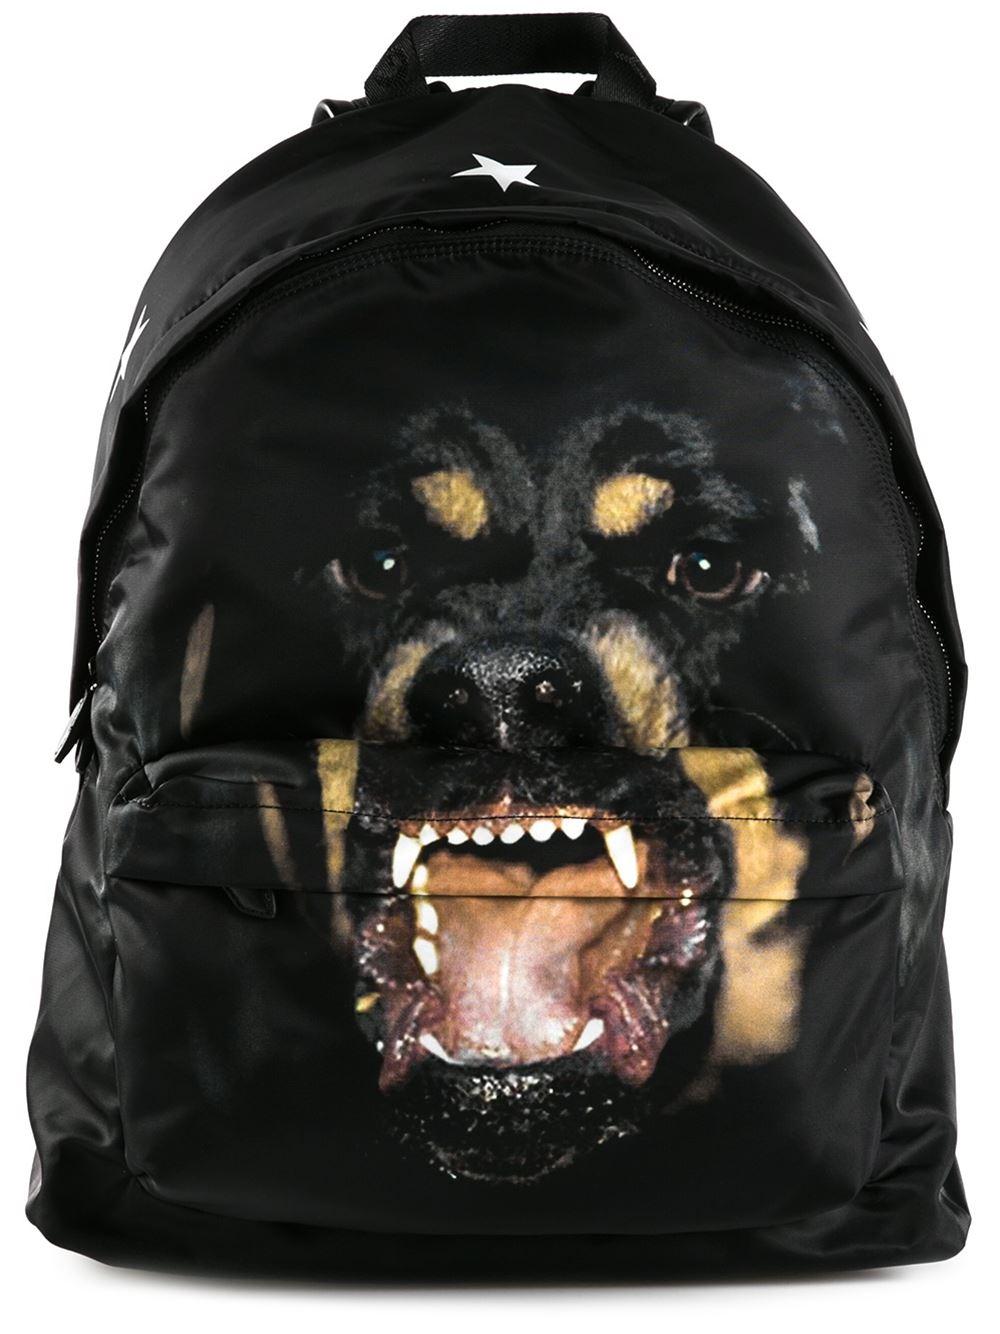 Lyst - Givenchy Rottweiler Print Backpack in Black for Men d2261d091454c